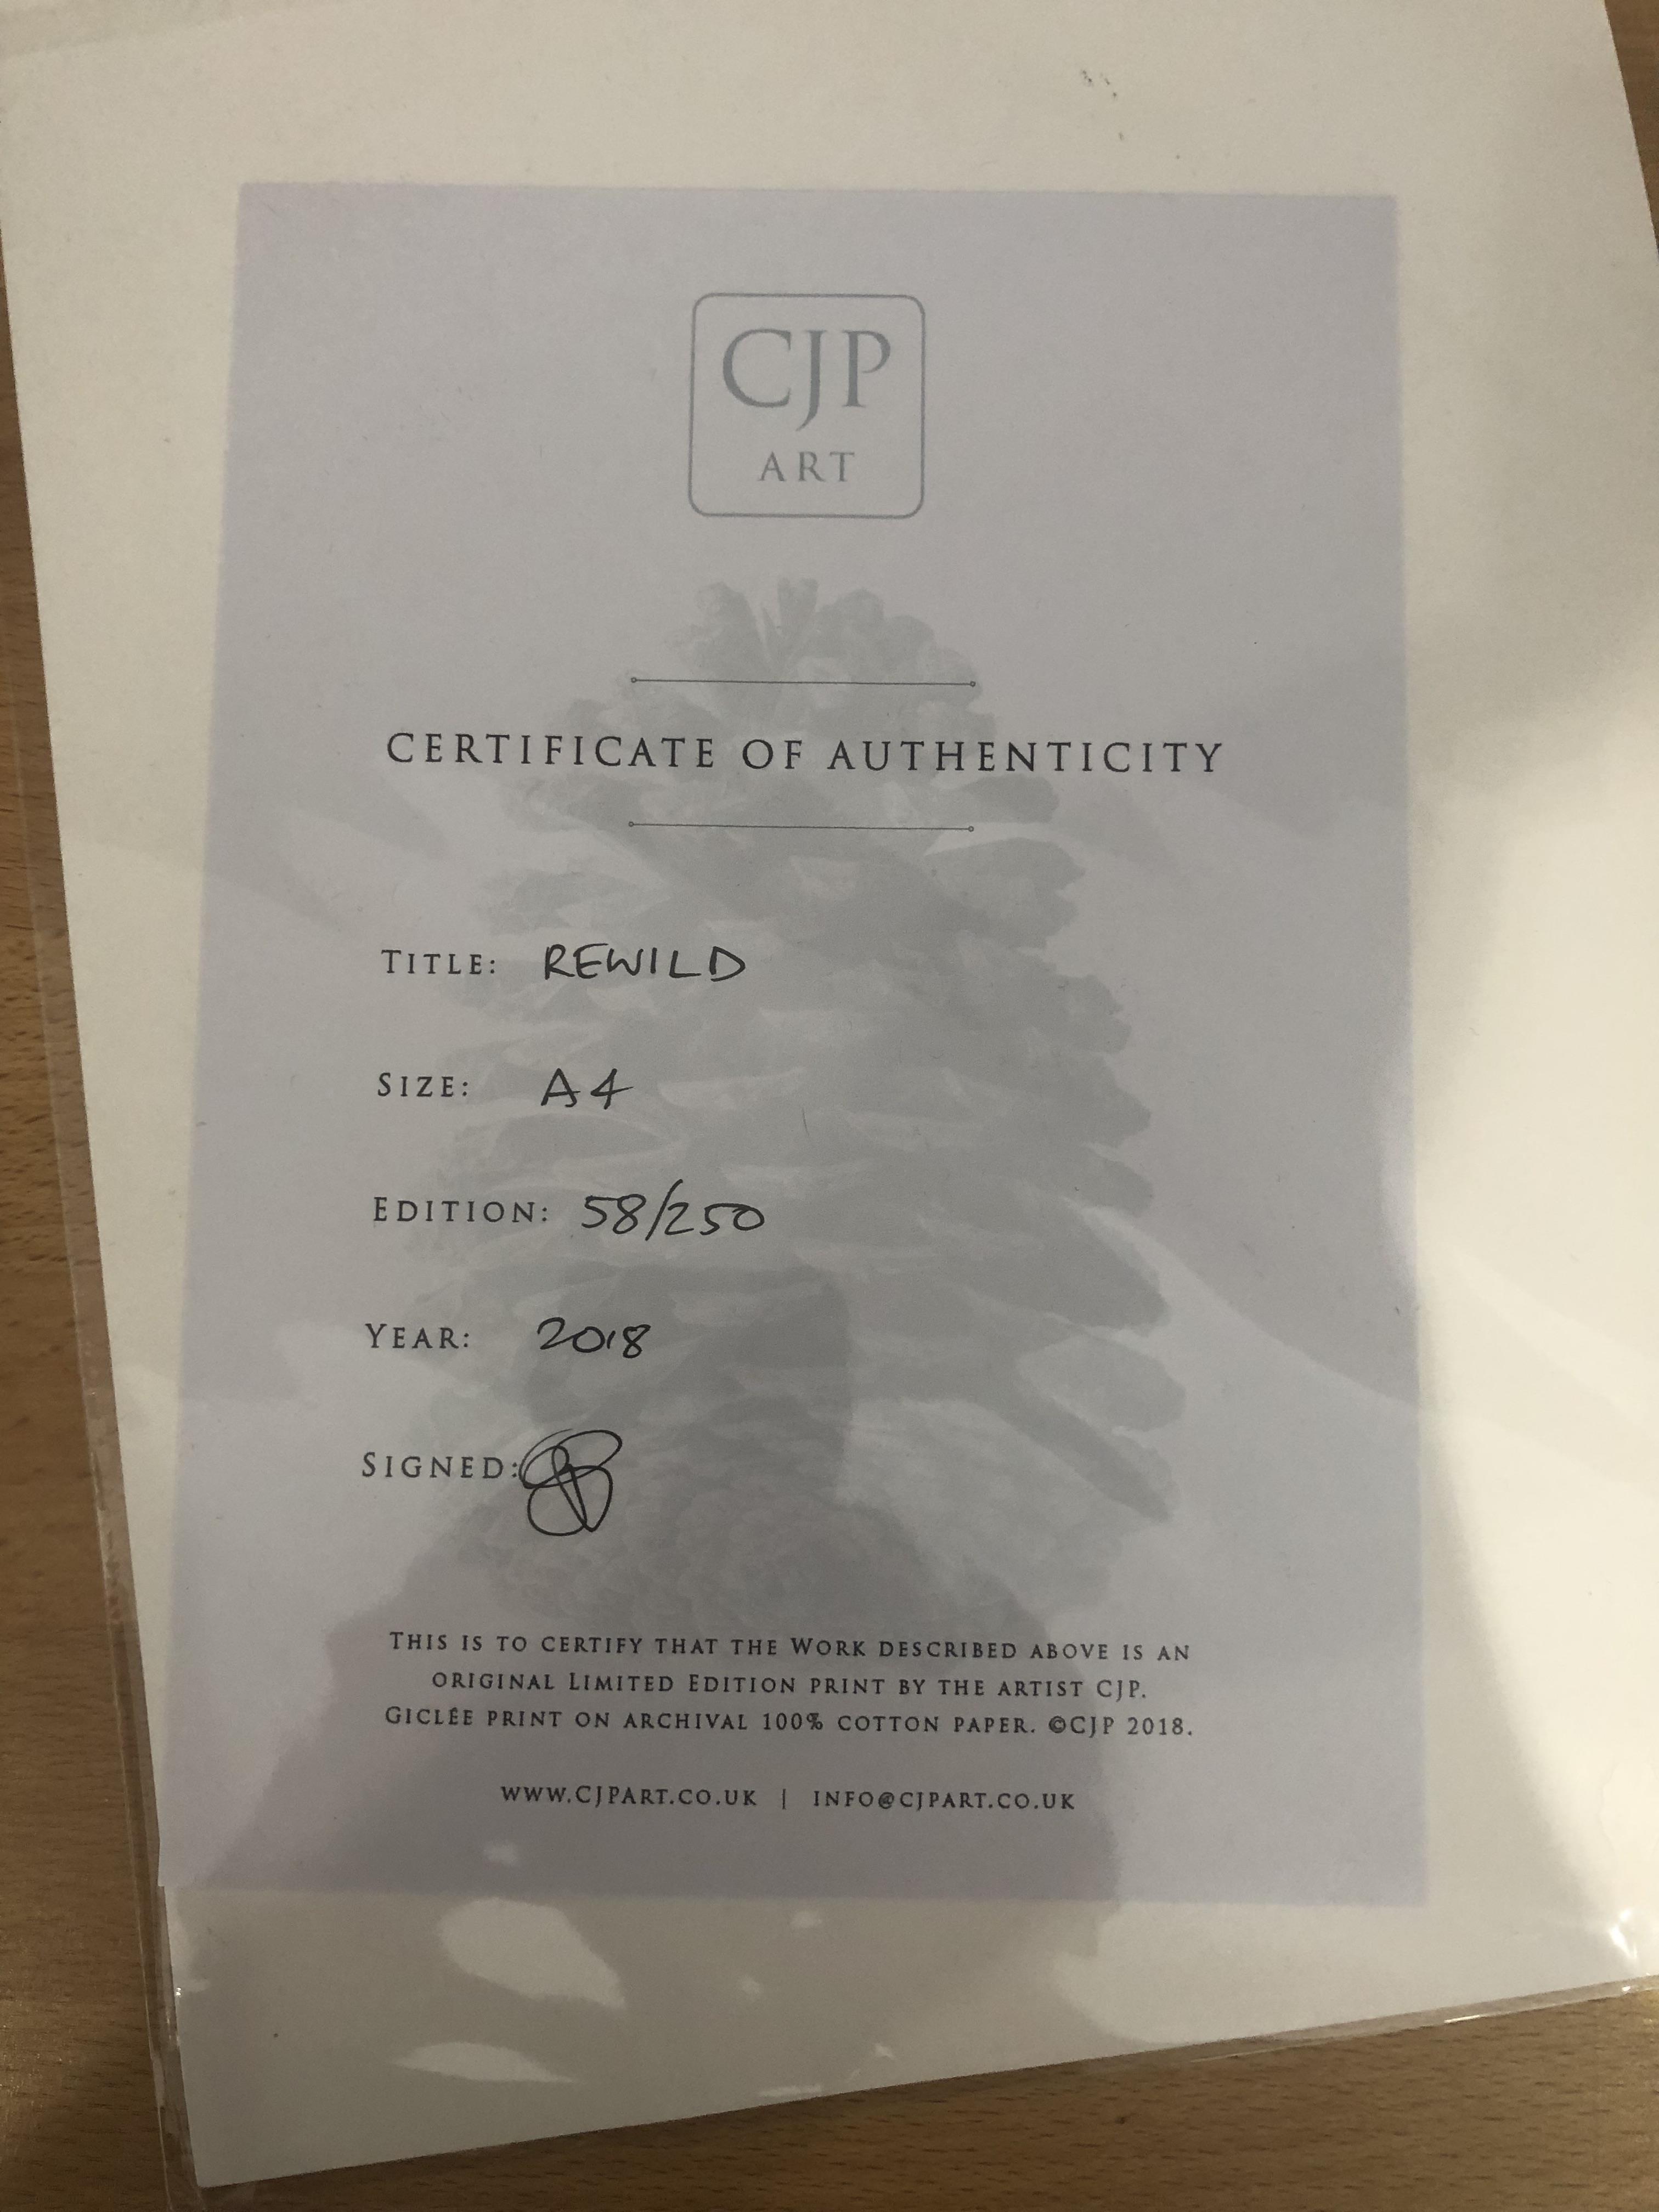 Lot 33 - CJP Art A4 Rewild Limited Edition Print